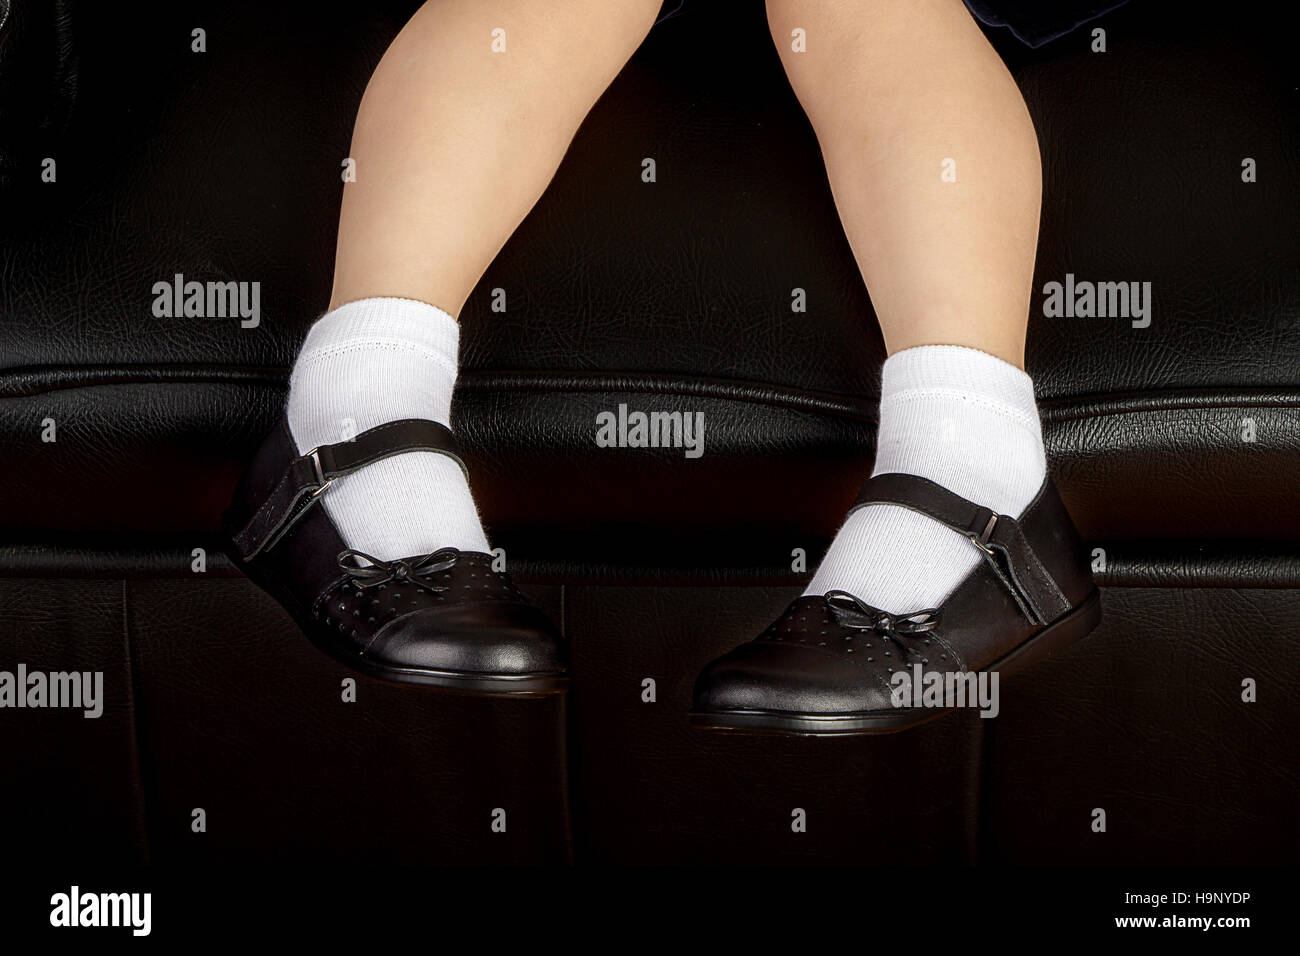 Woman Wearing White Socks Stock Photos  Woman Wearing -7701